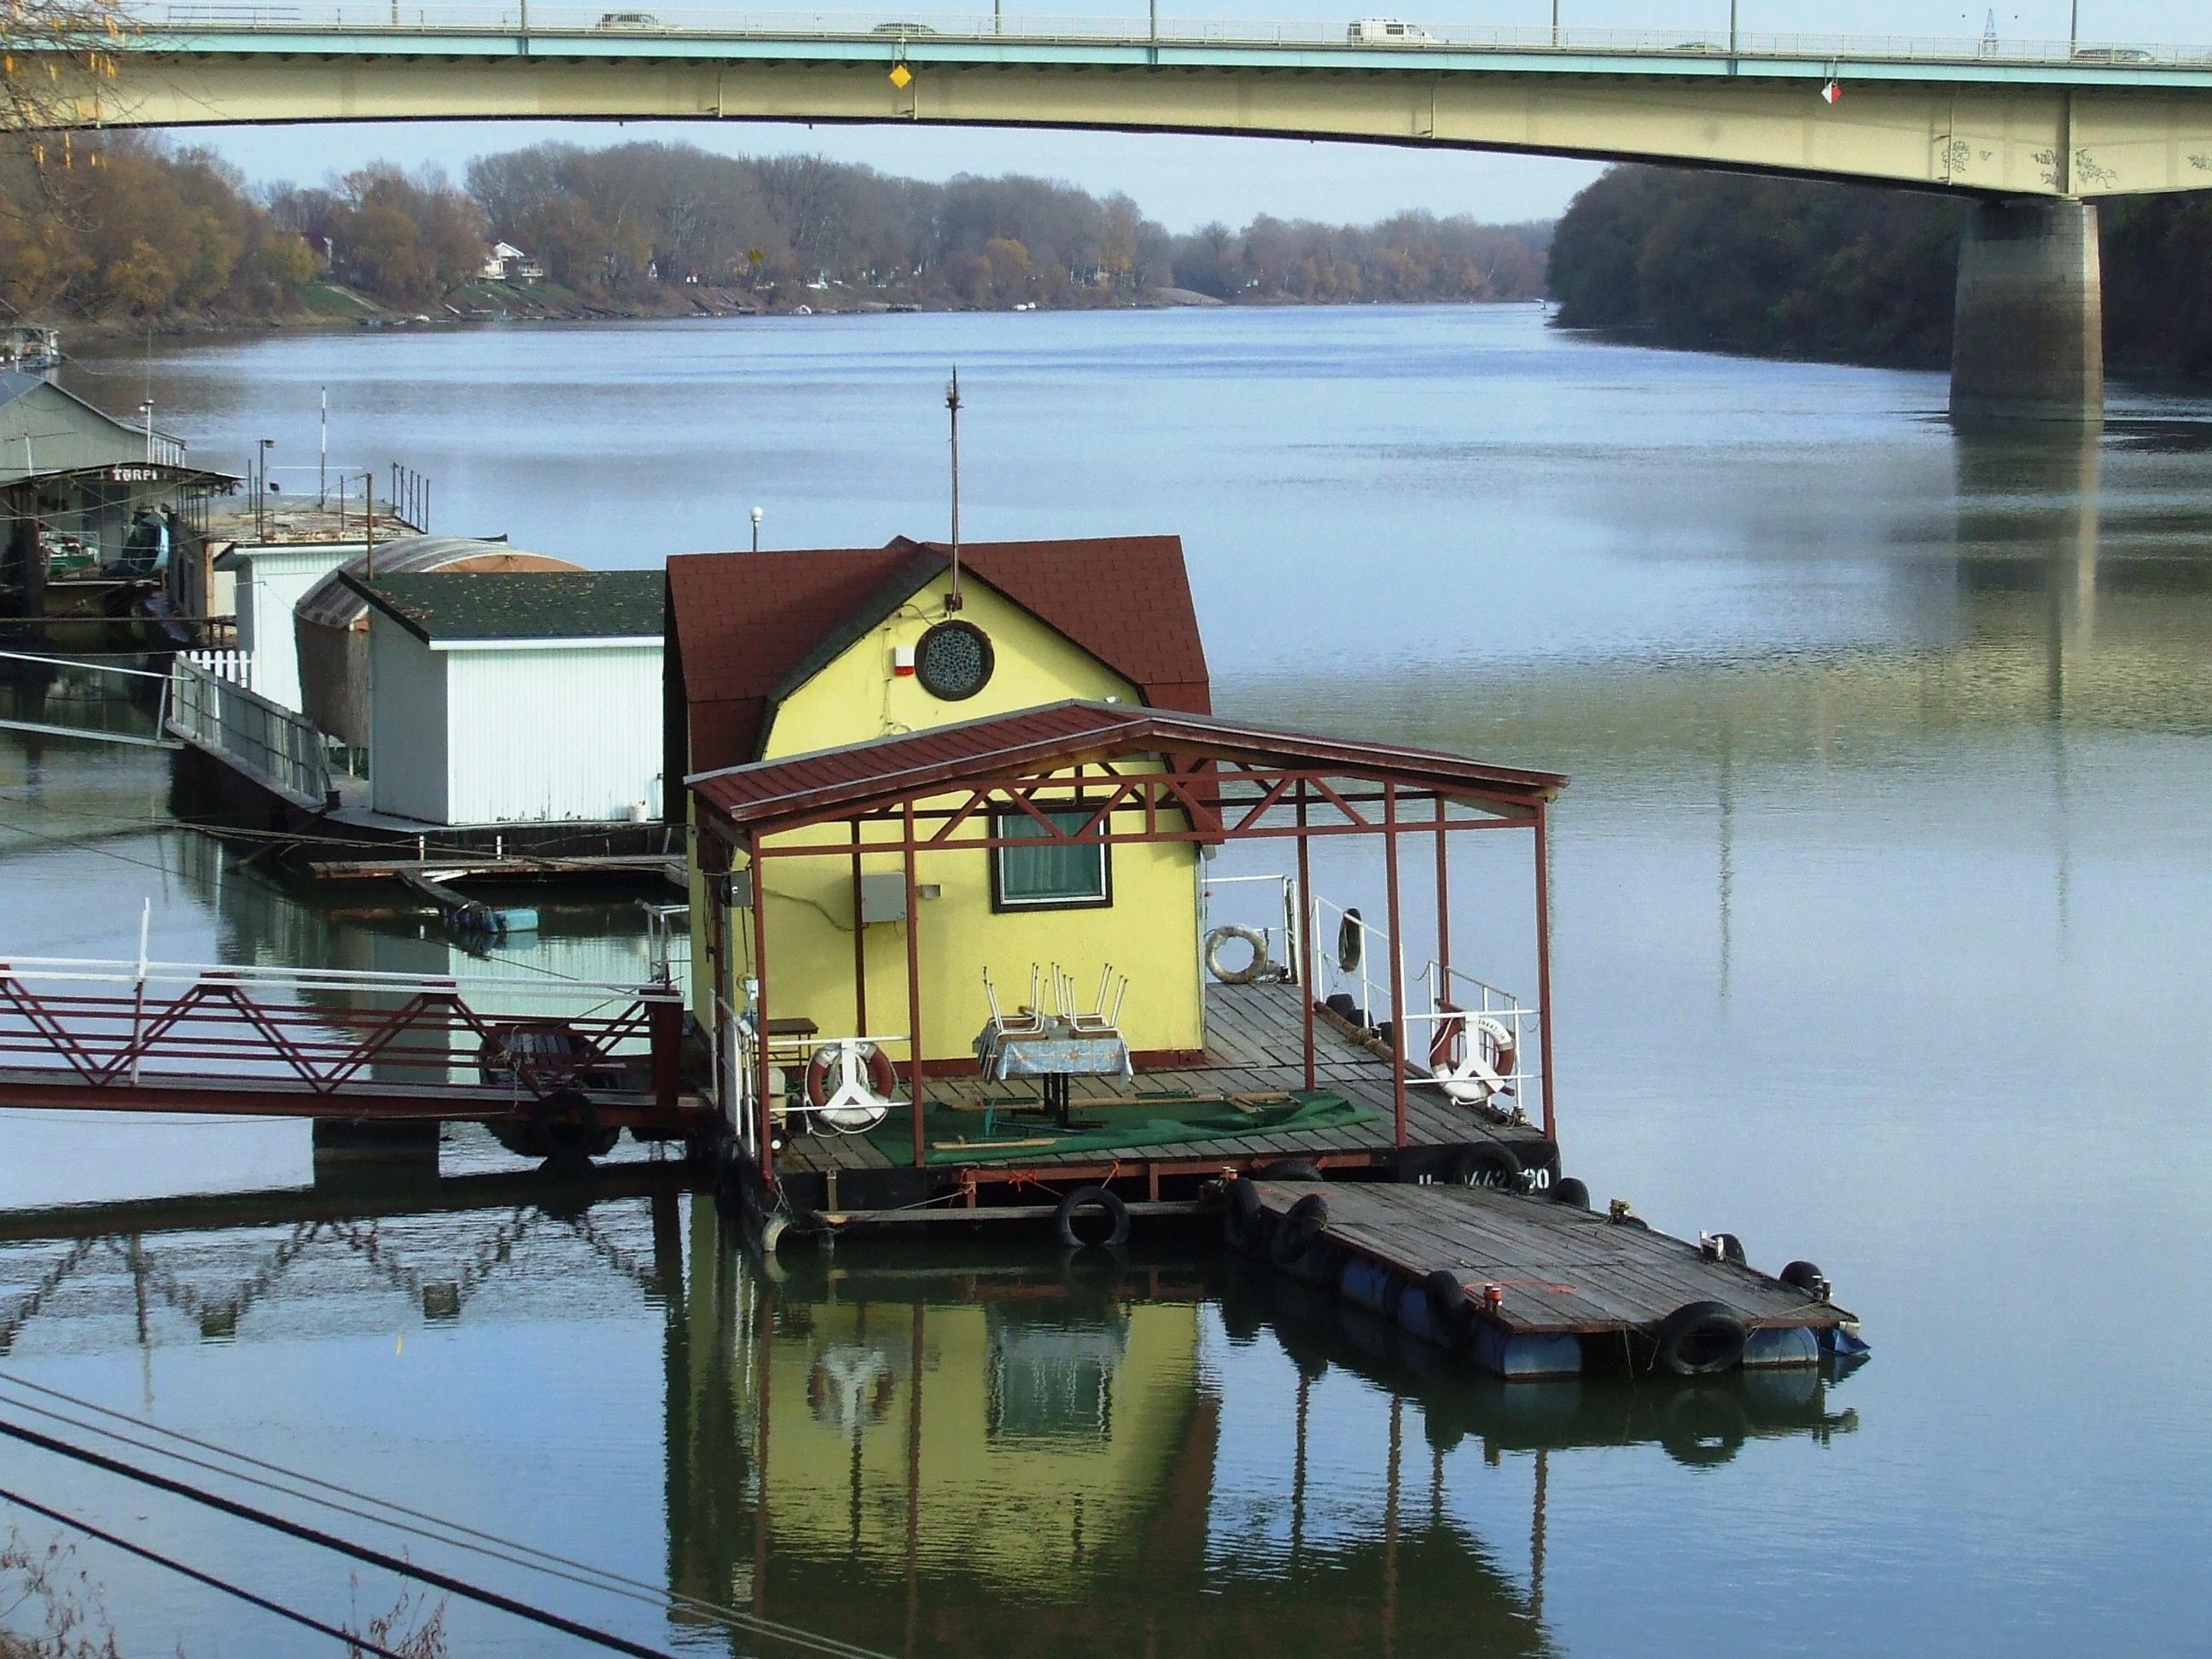 Fotos gratis : agua, muelle, barco, río, canal, enviar, transporte ...